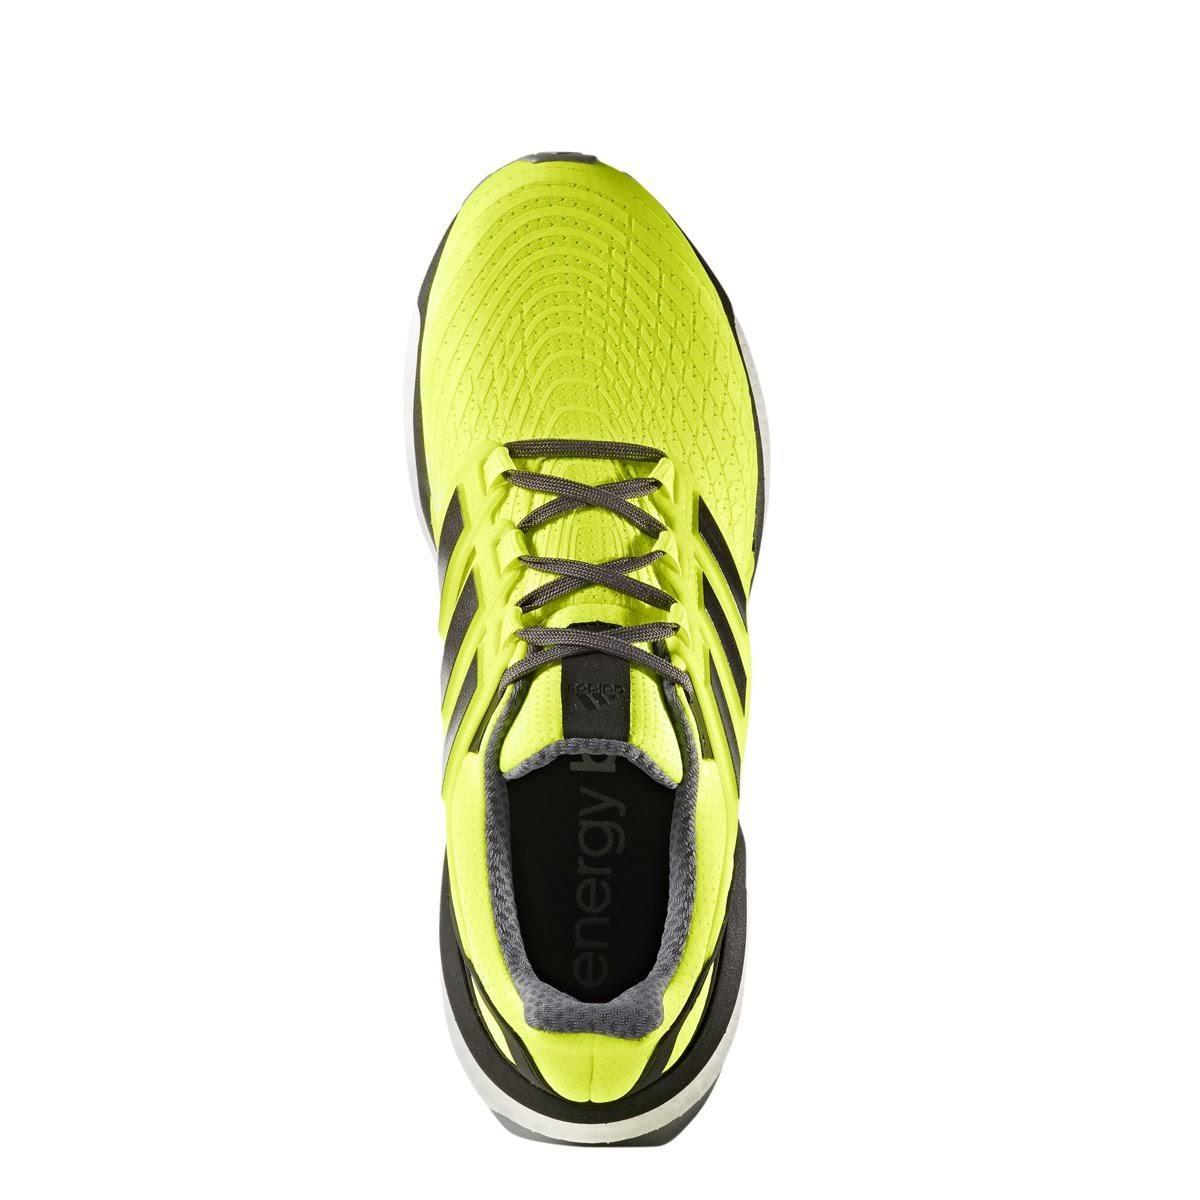 Hombre Para Energy Zapatillas Adidas Boost De Running M q06gwHRf